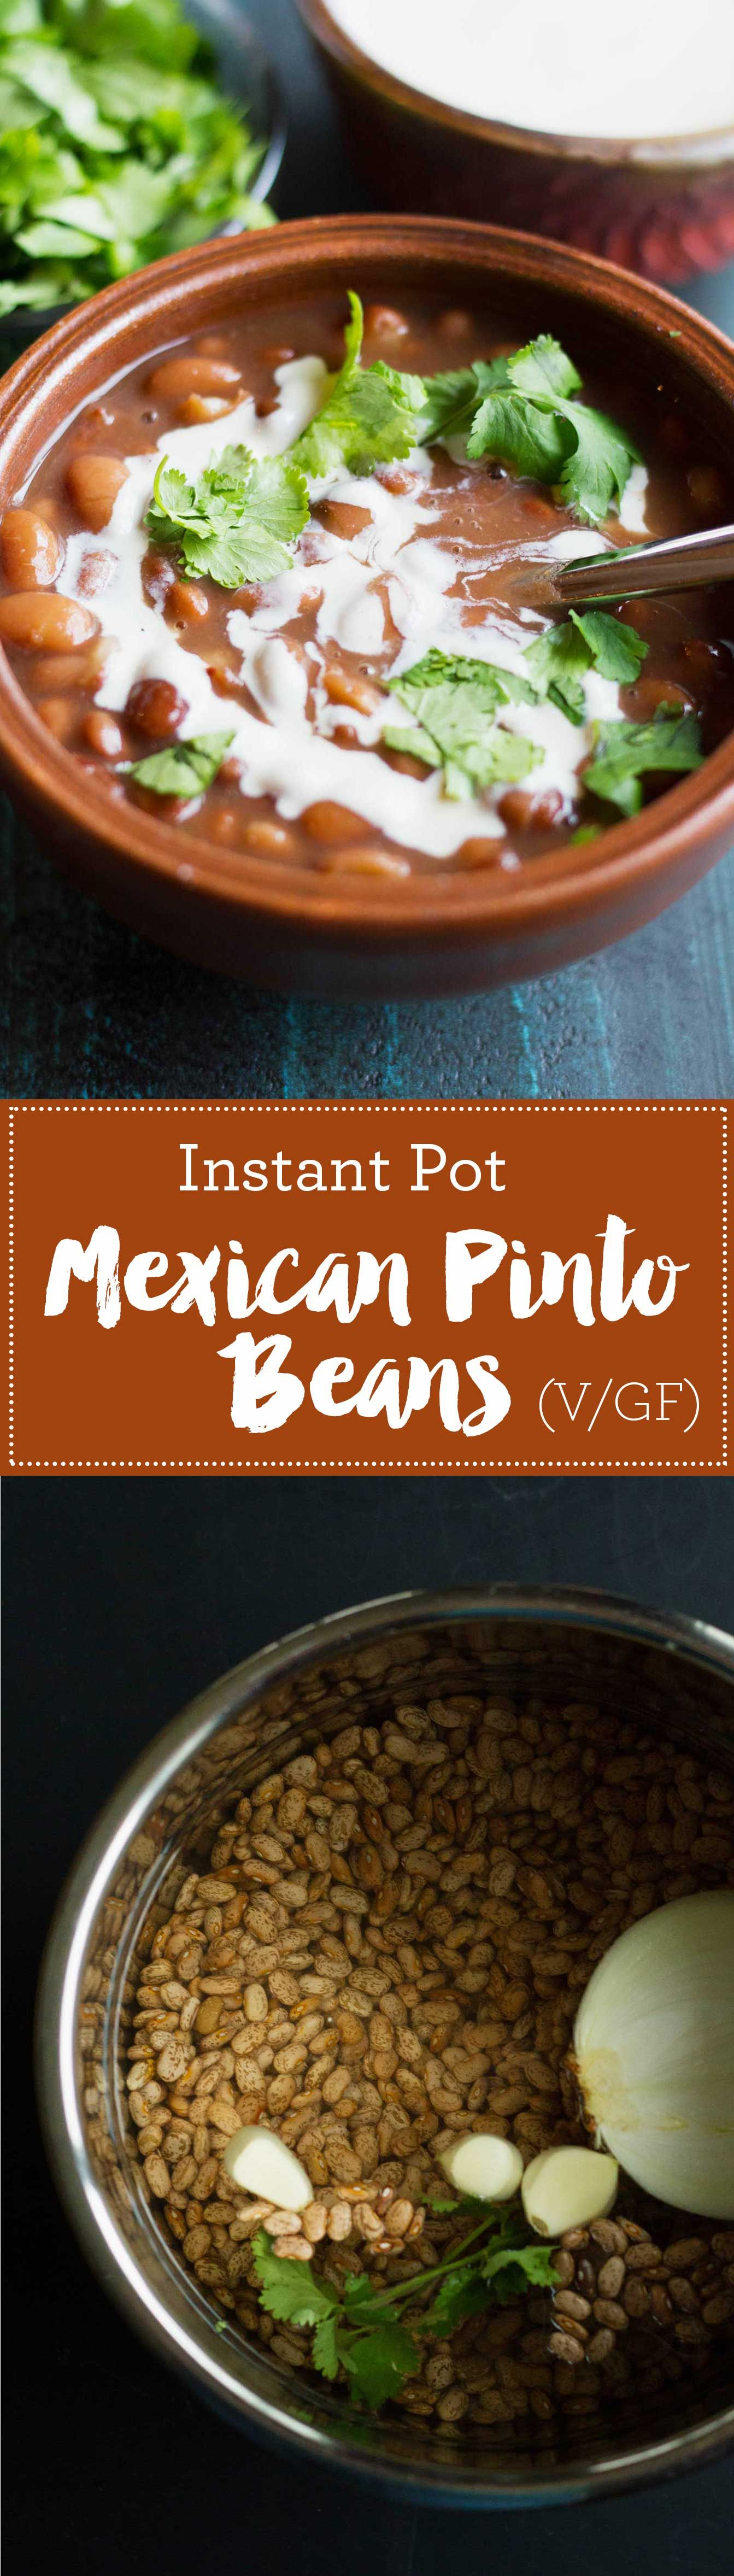 Instant Pot Mexican Pinto Beans Vegan